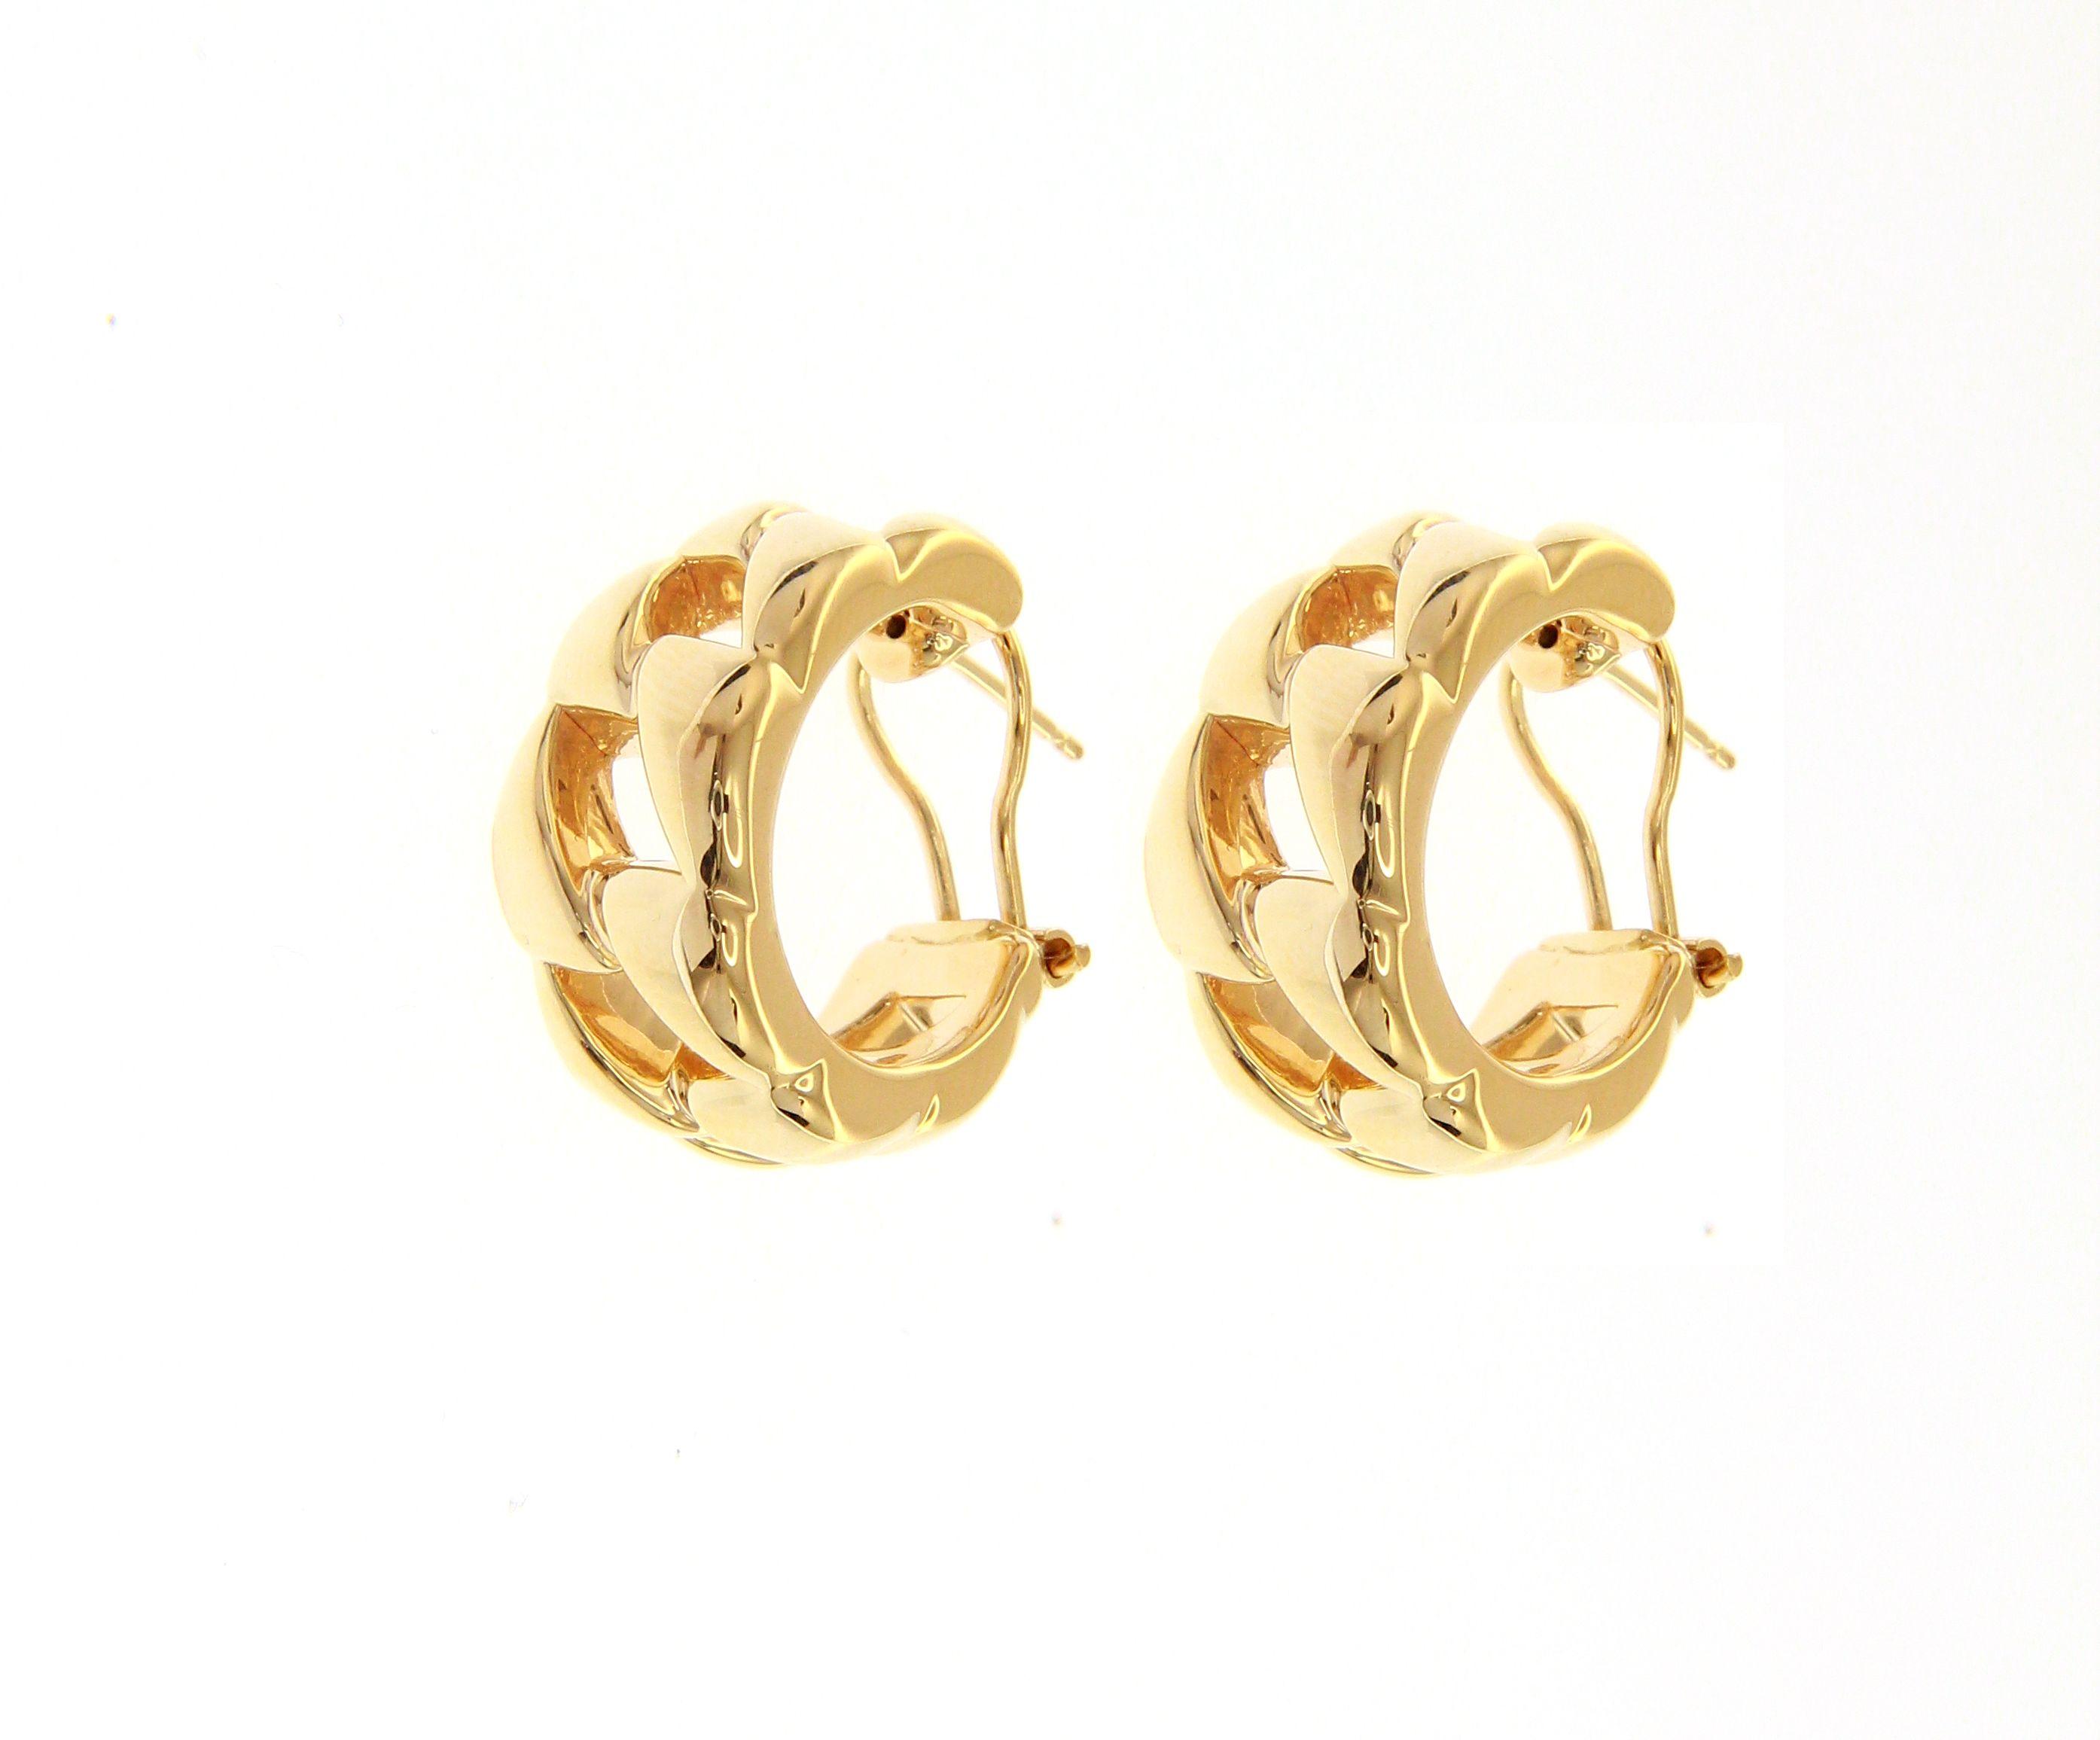 Beautiful 18ct Yellow Gold Stud/Clip Earrings